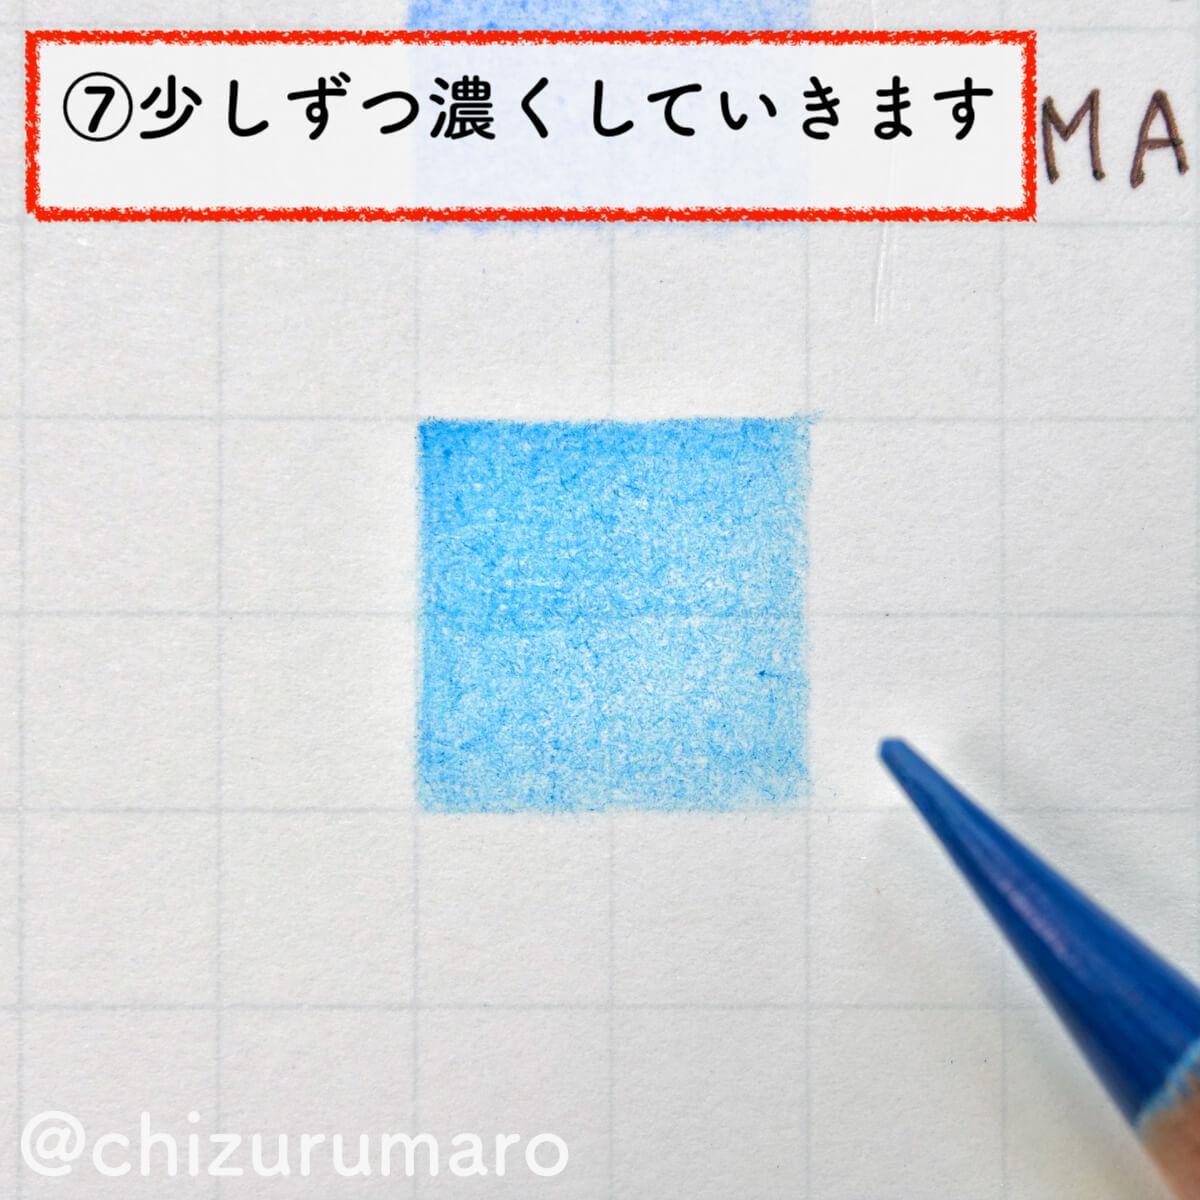 f:id:chizurumaro:20200921220215j:plain